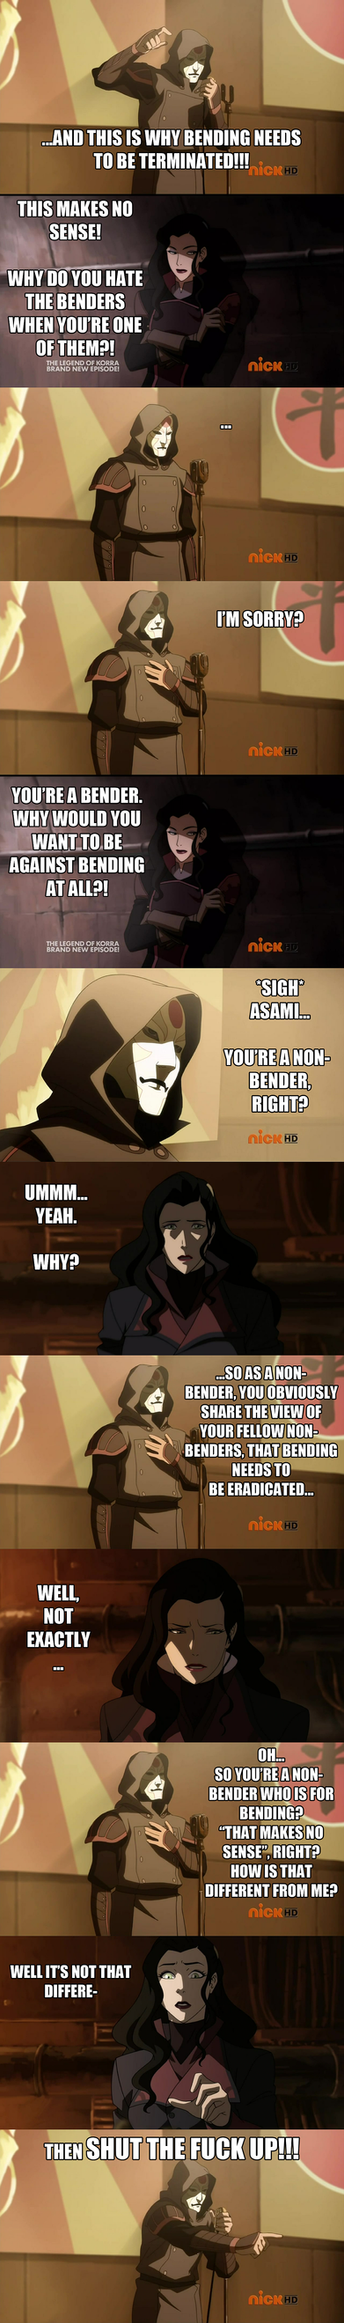 Avatar - Legend of Korra: Amon vs Asami by yourparodies